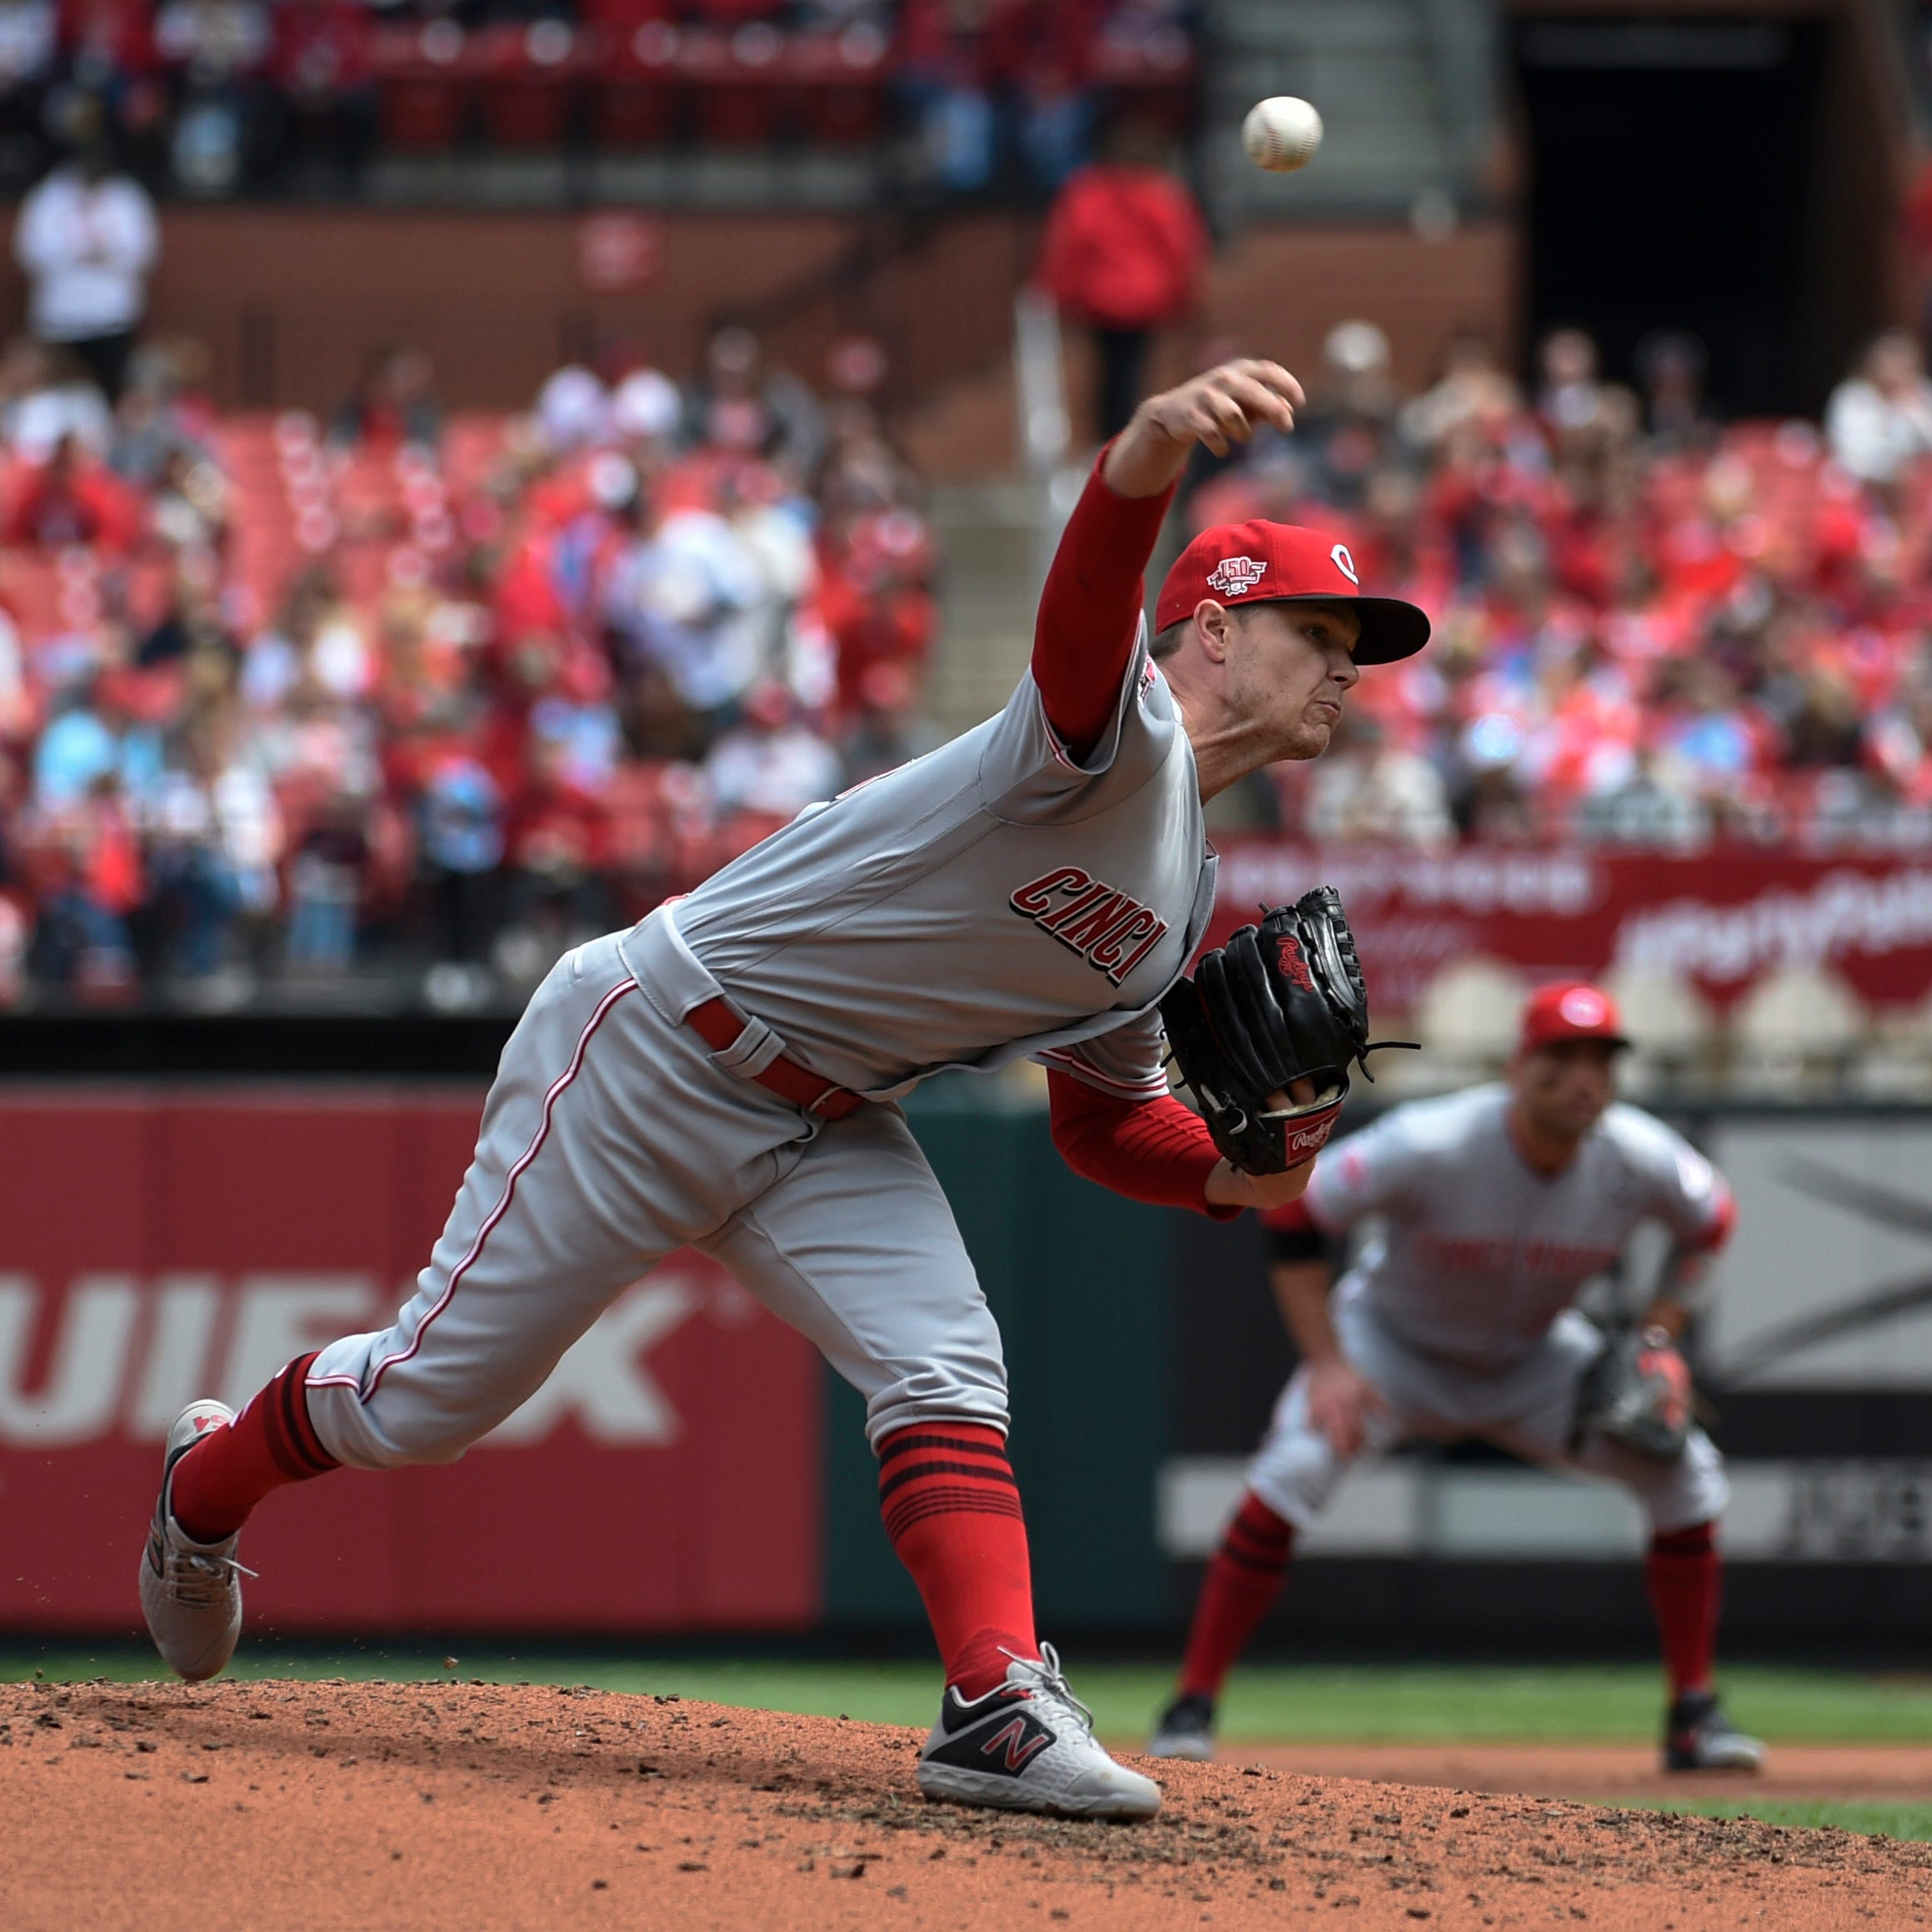 Cincinnati Reds' bats go quiet in a 5-2 loss in the series finale against St. Louis Cardinals